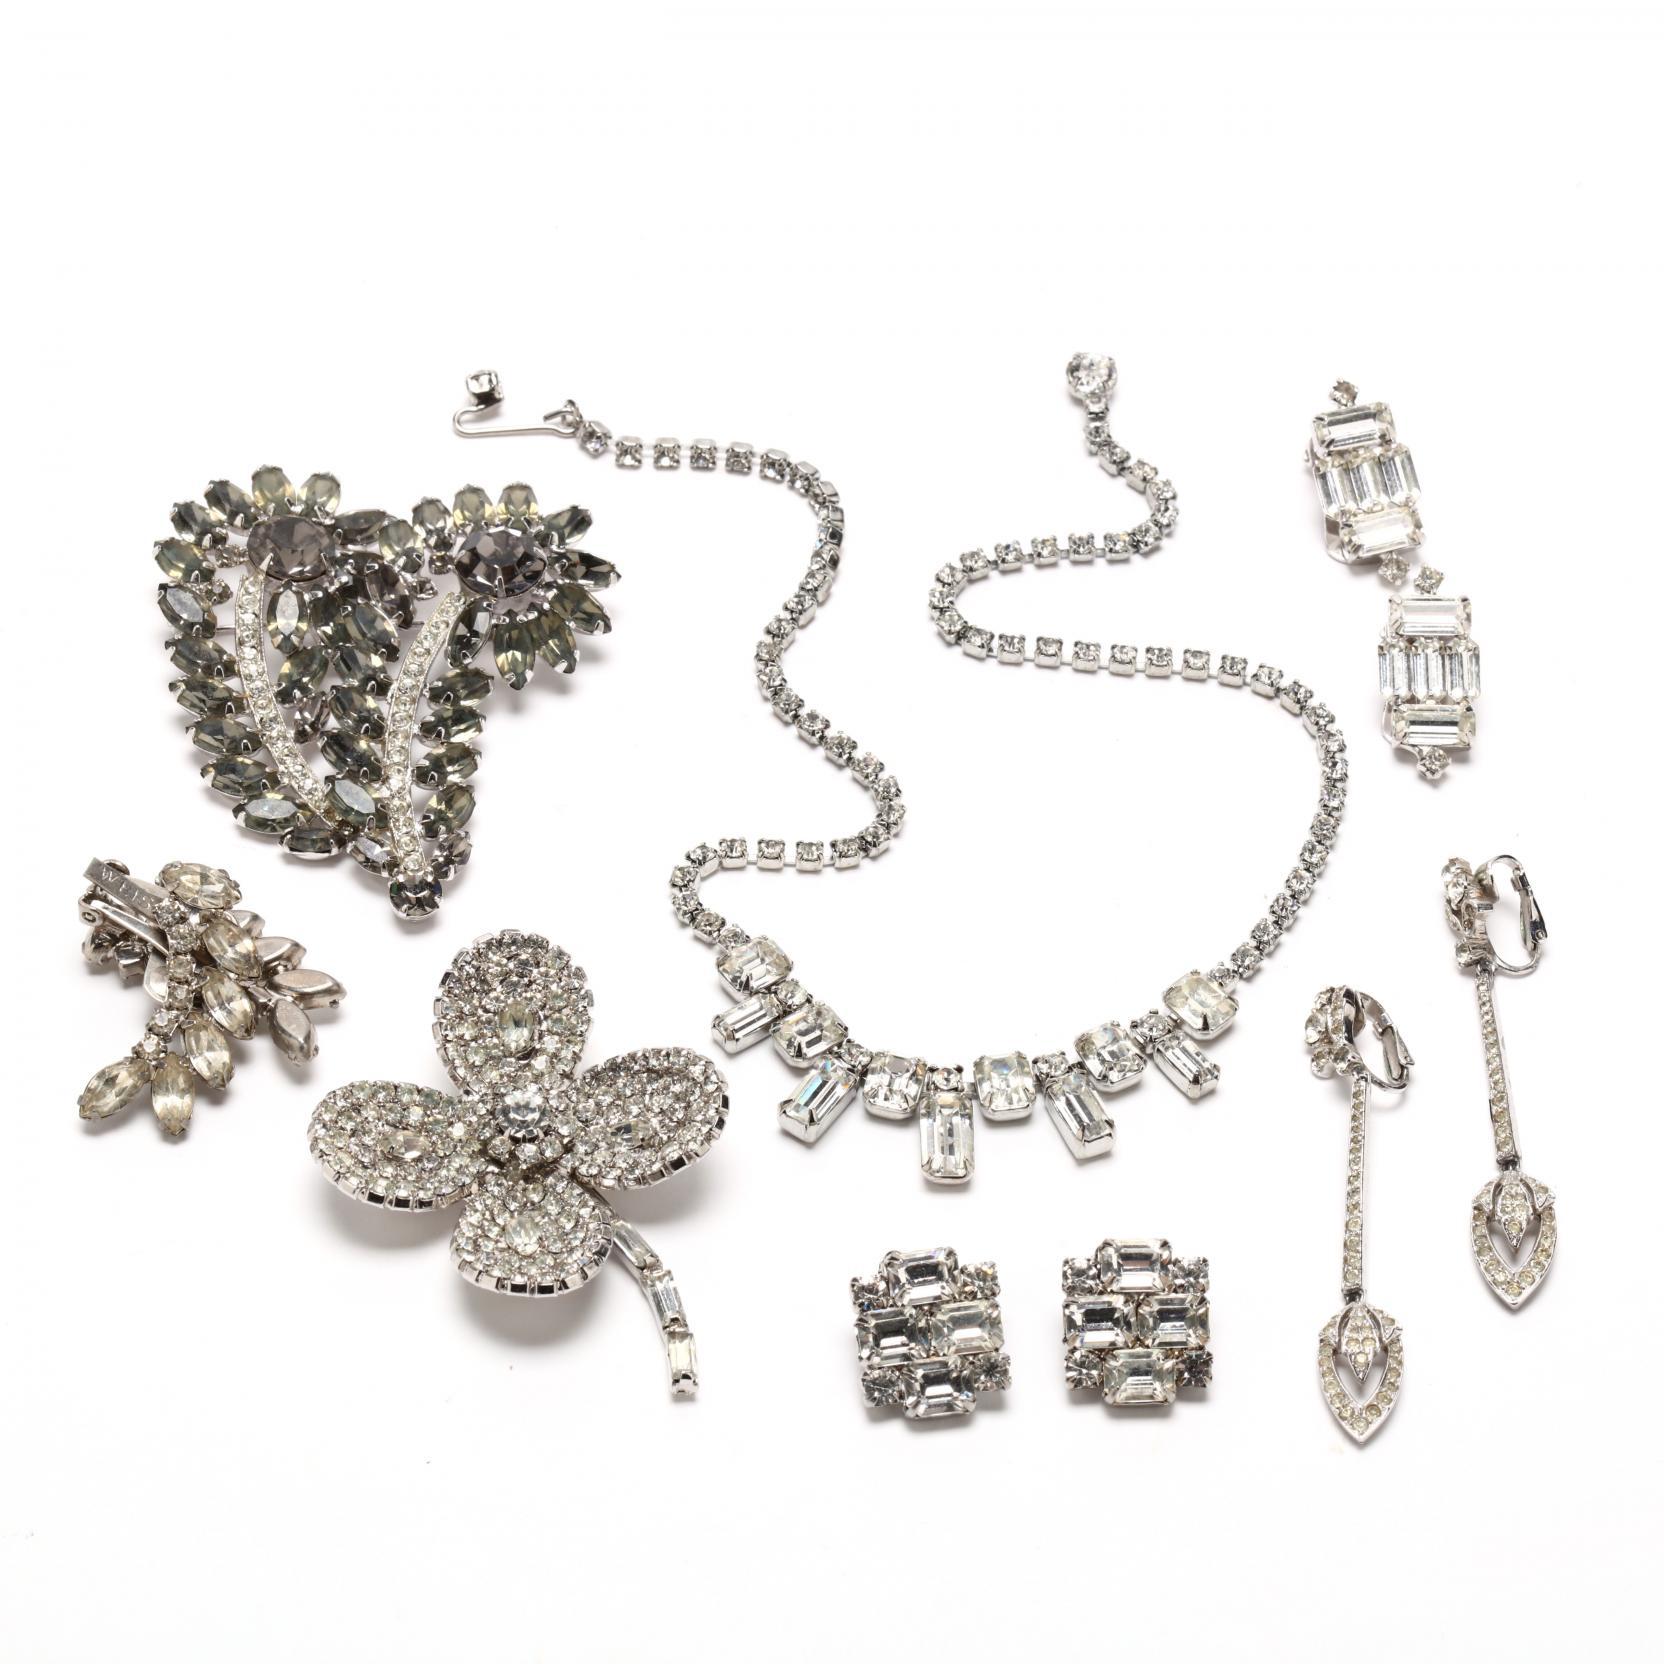 group-of-vintage-designer-rhinestone-jewelry